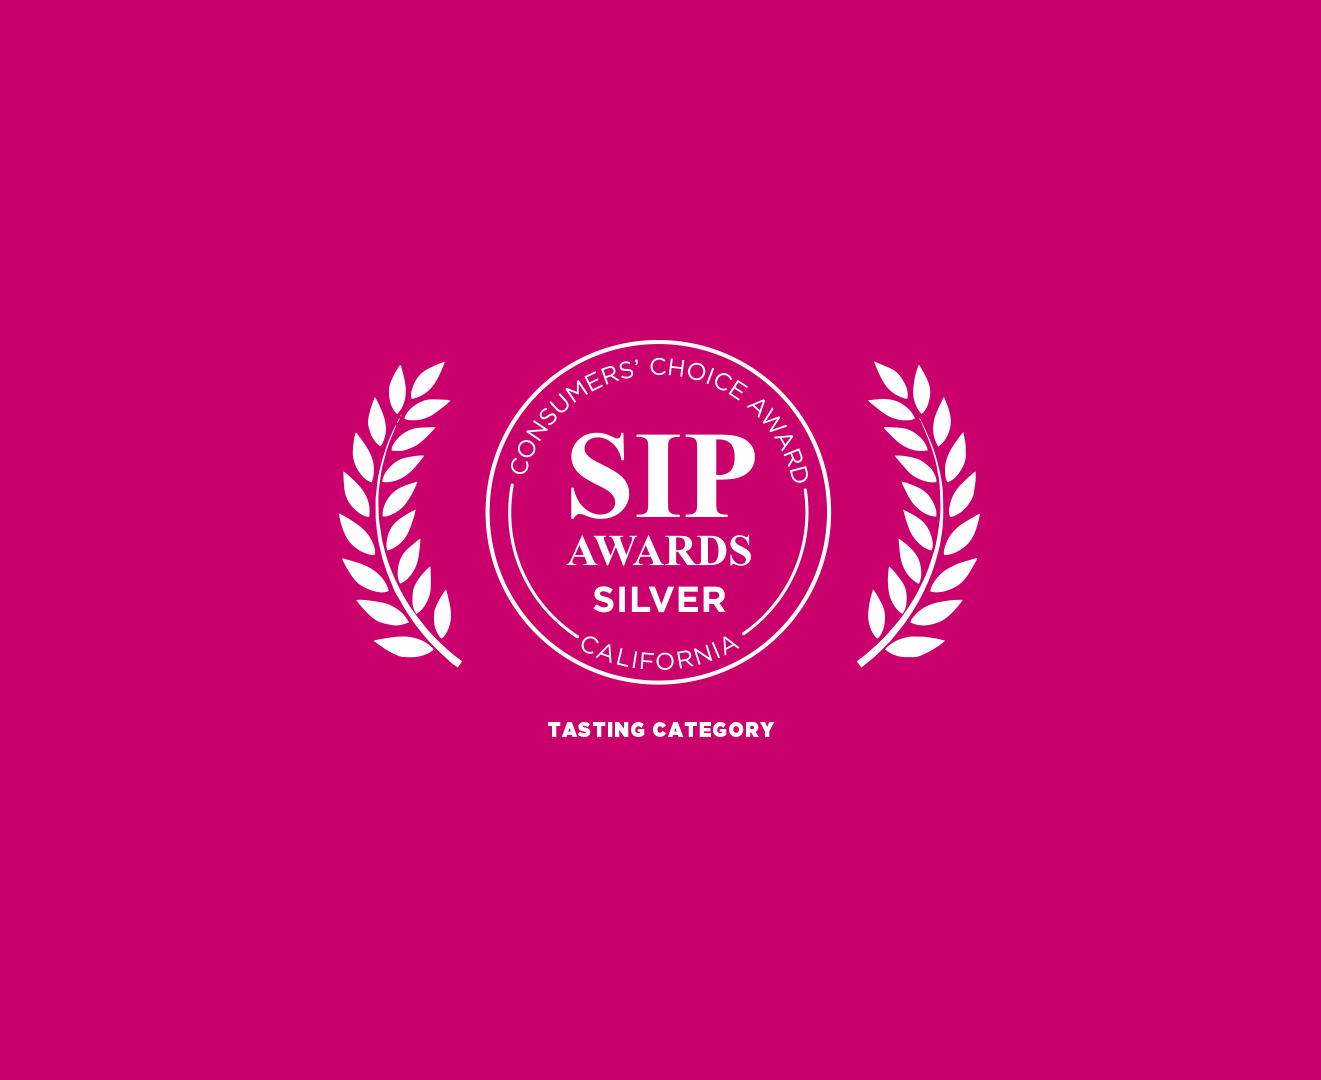 bg-award-sip-silver